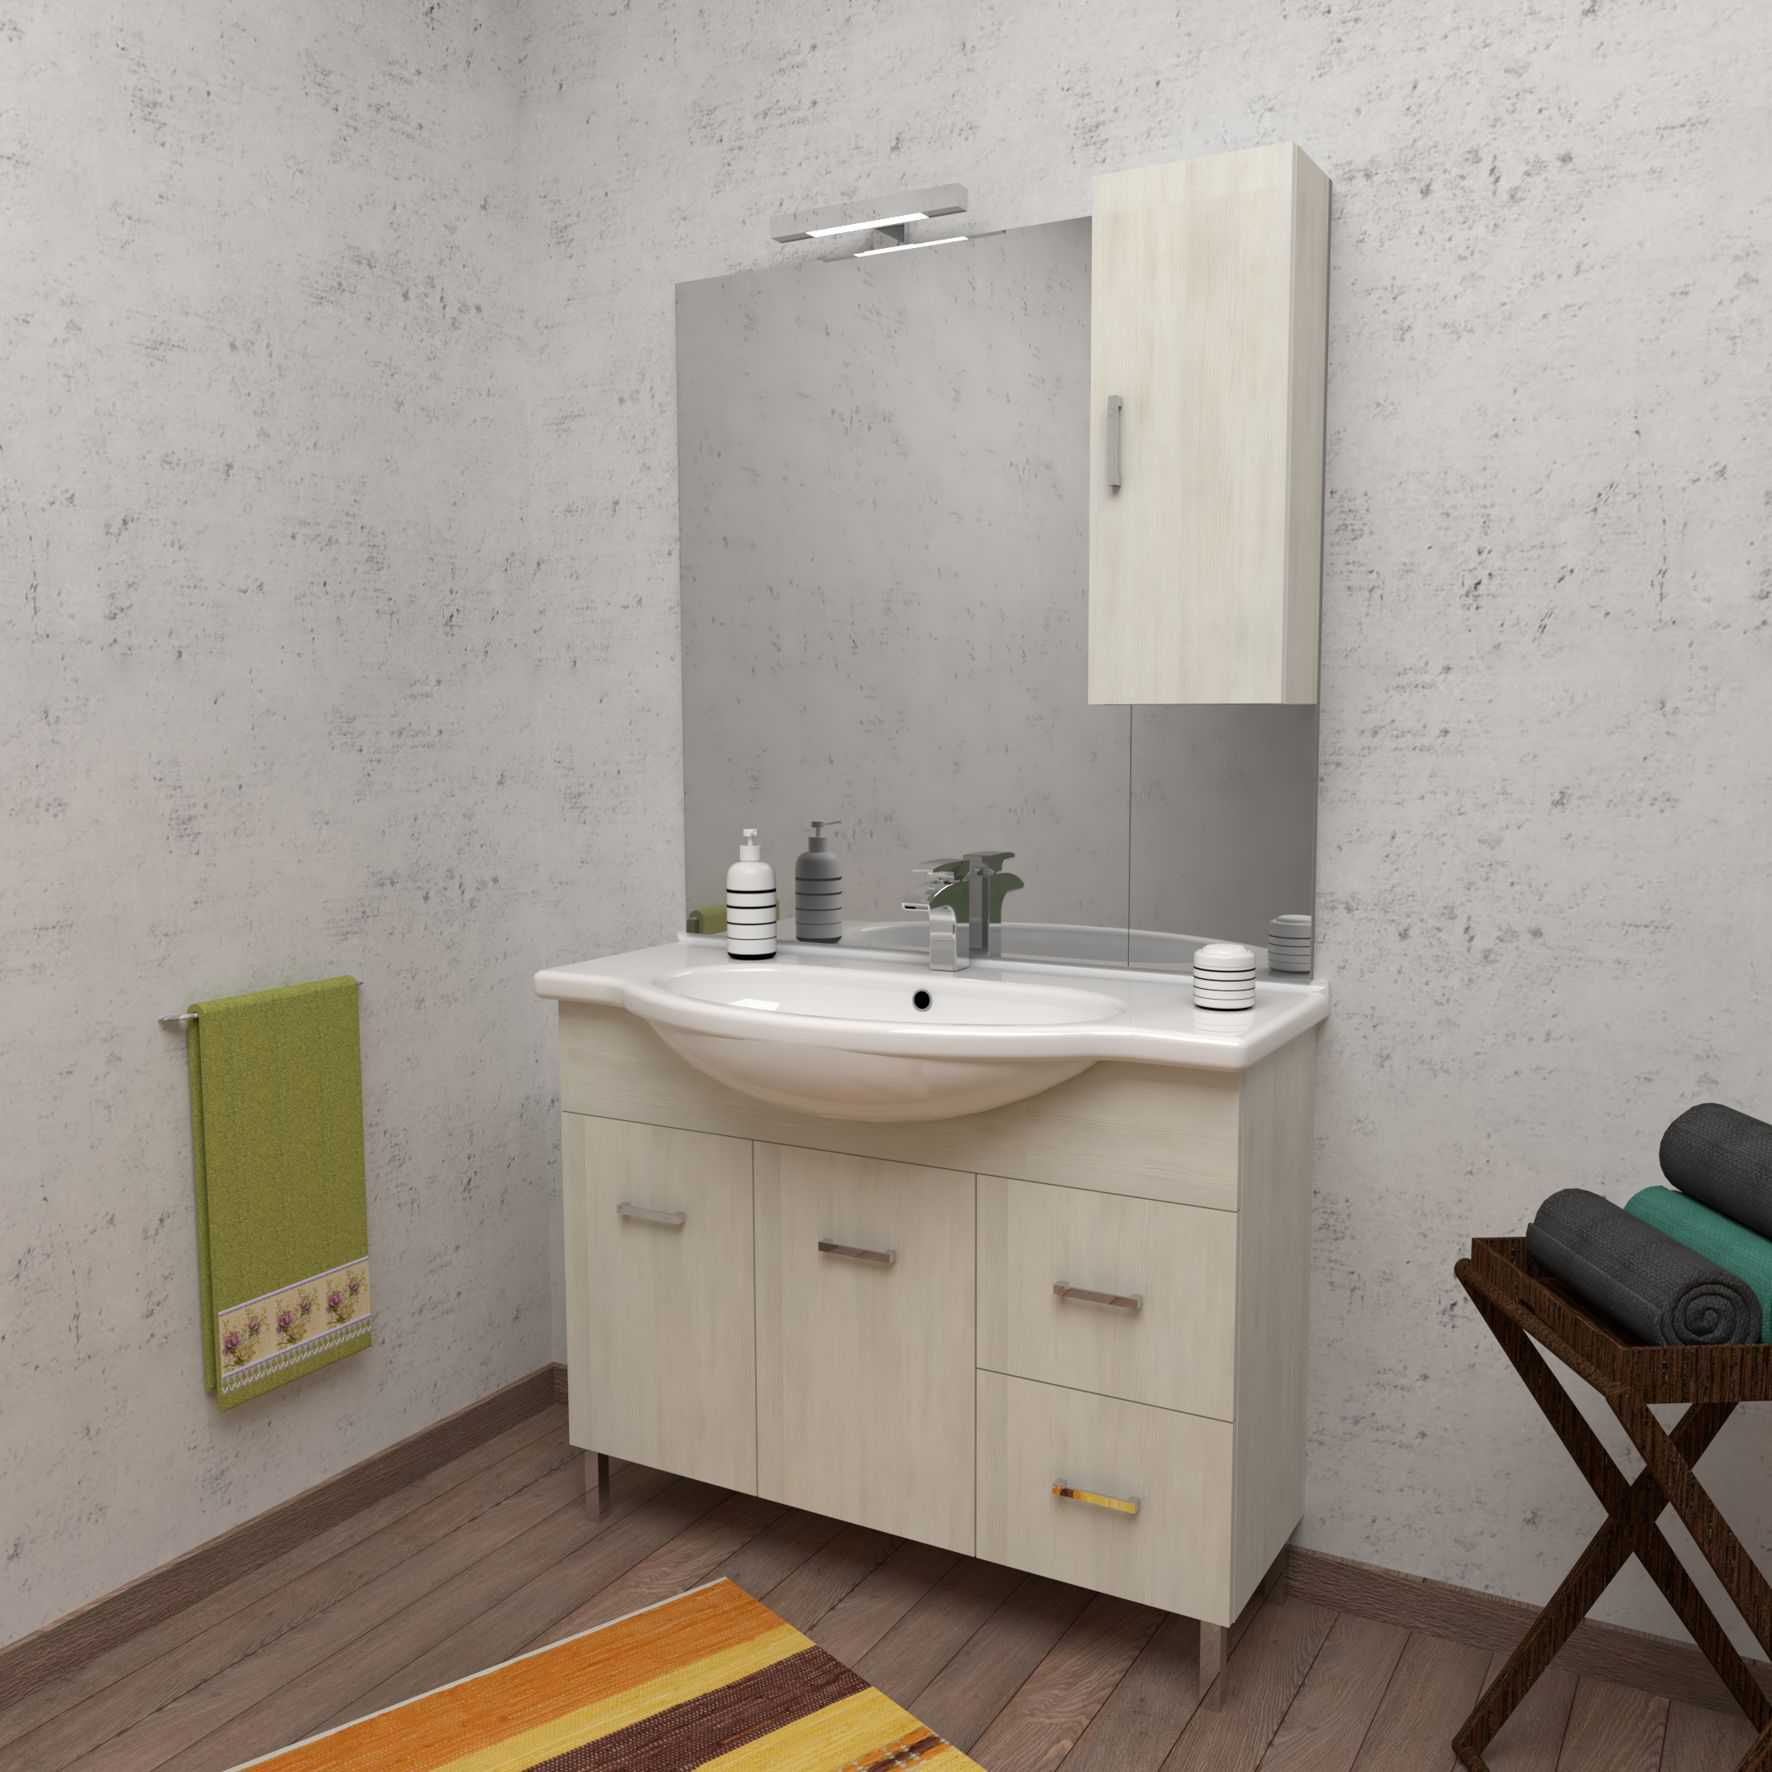 Mobile bagno a terra PALMA 105 cm 105x50 bianco larice con lavabo in ceramica